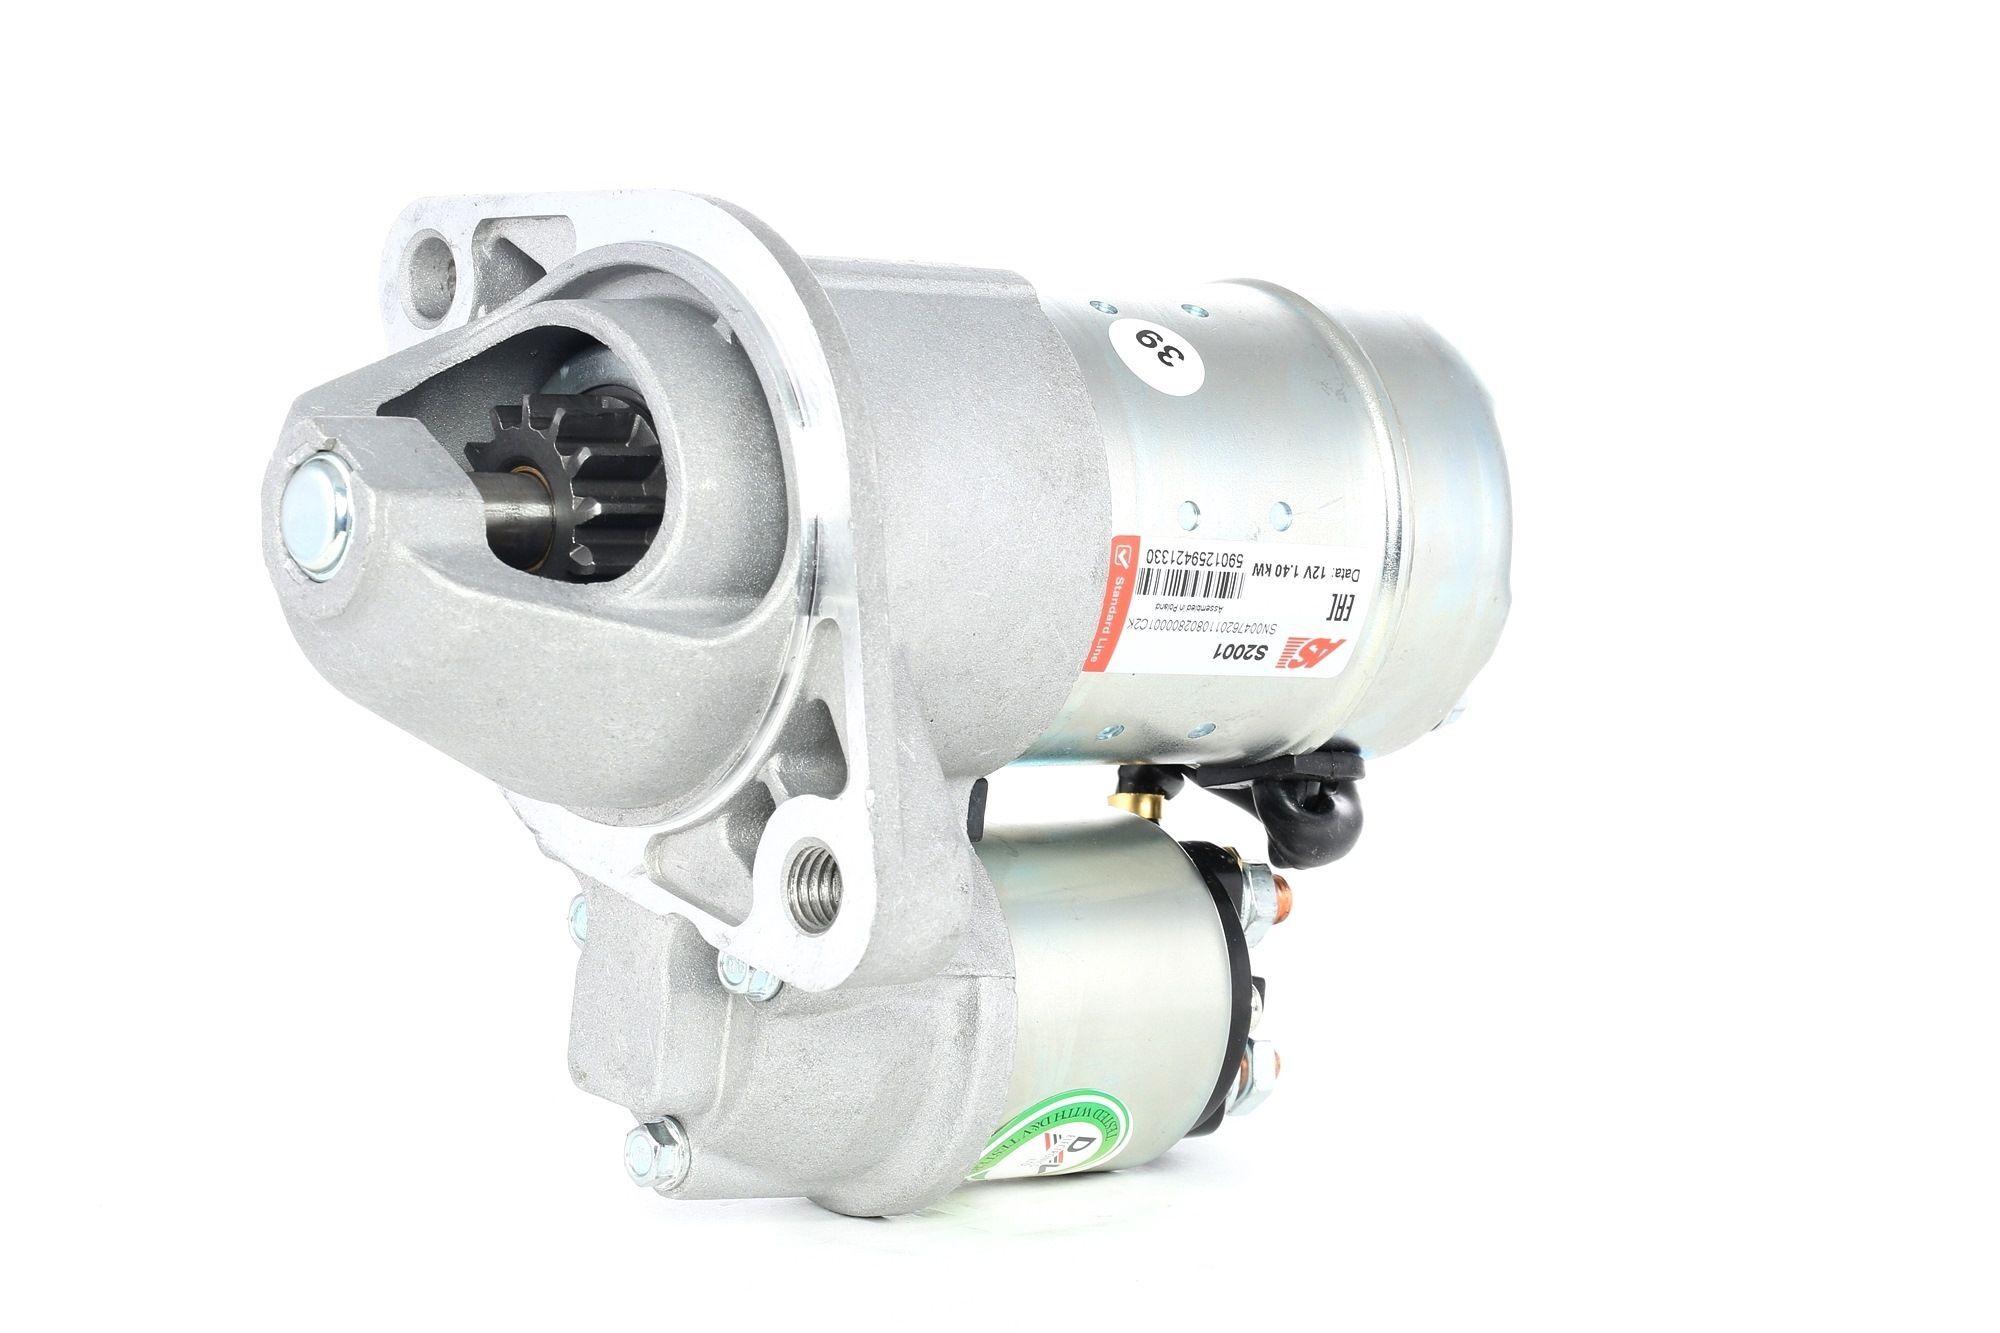 AS-PL Starttimoottori Brand new AS-PL Starter motor armature S2001 Startti,Käynnistinmoottori OPEL,HONDA,CHEVROLET,CORSA D,CORSA C F08, F68